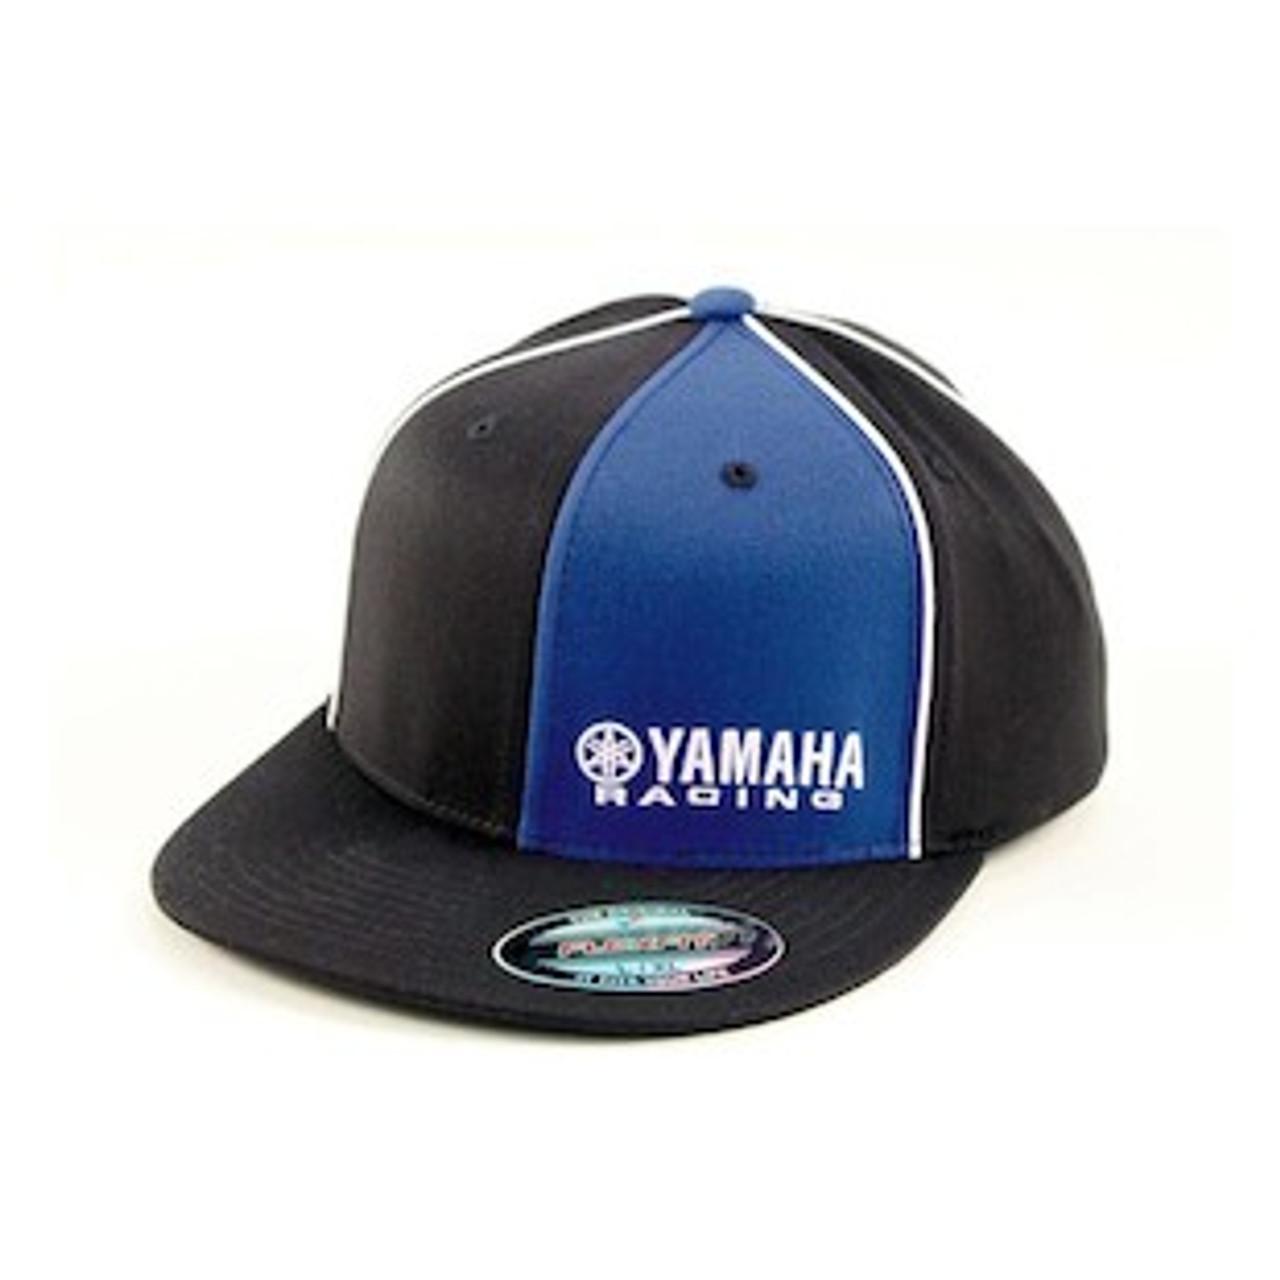 807de095413 Factory Effex Yamaha Racing Flexfit Hat